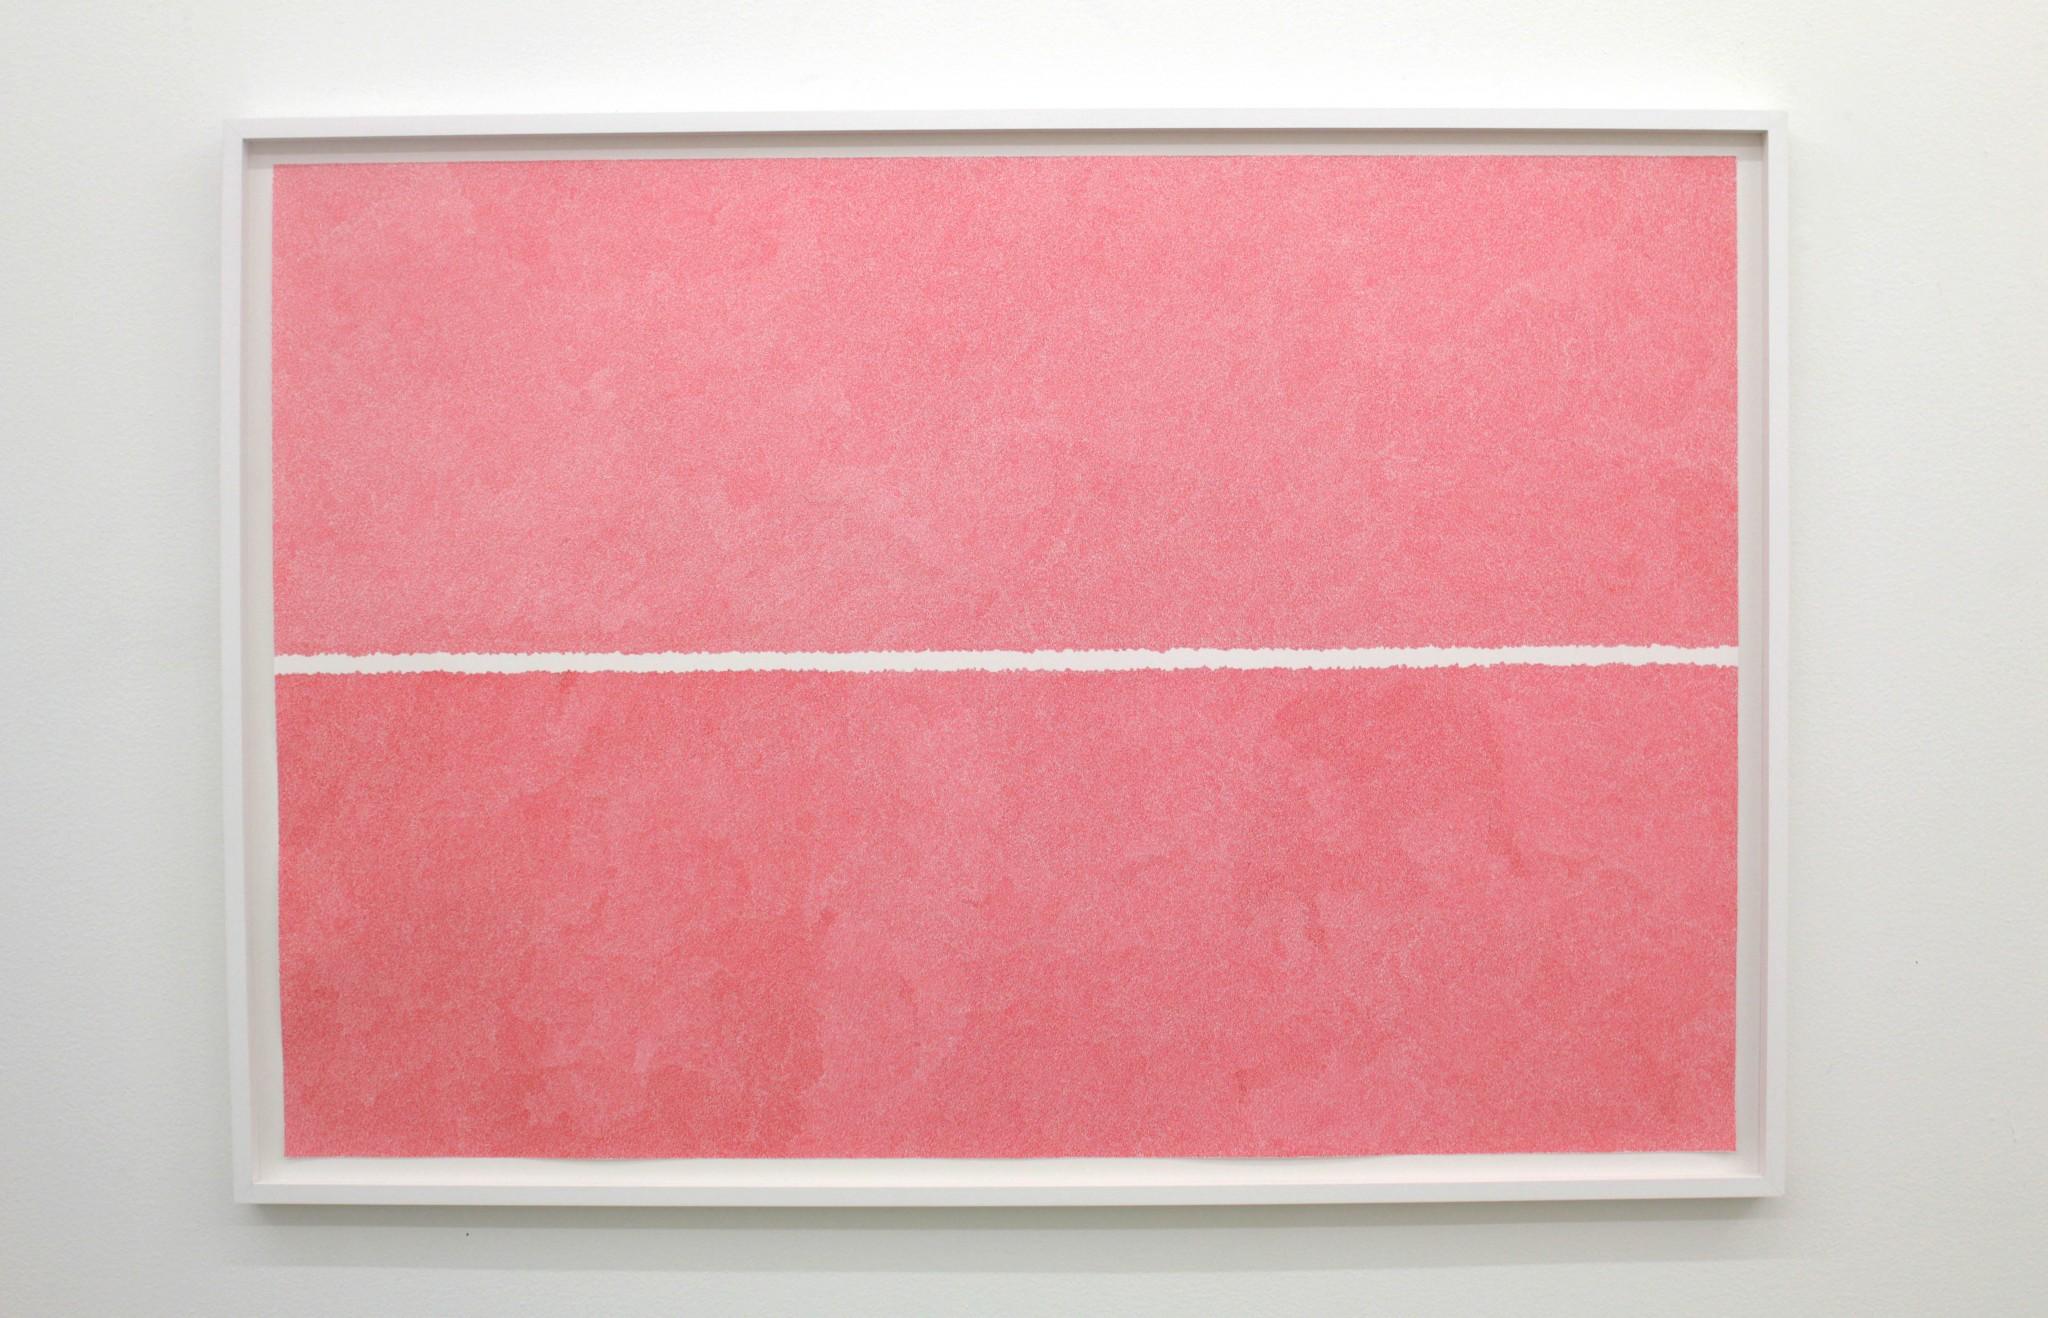 Between-two-lines-röd-75x110cm-2018-Material-Tusch-på-papper